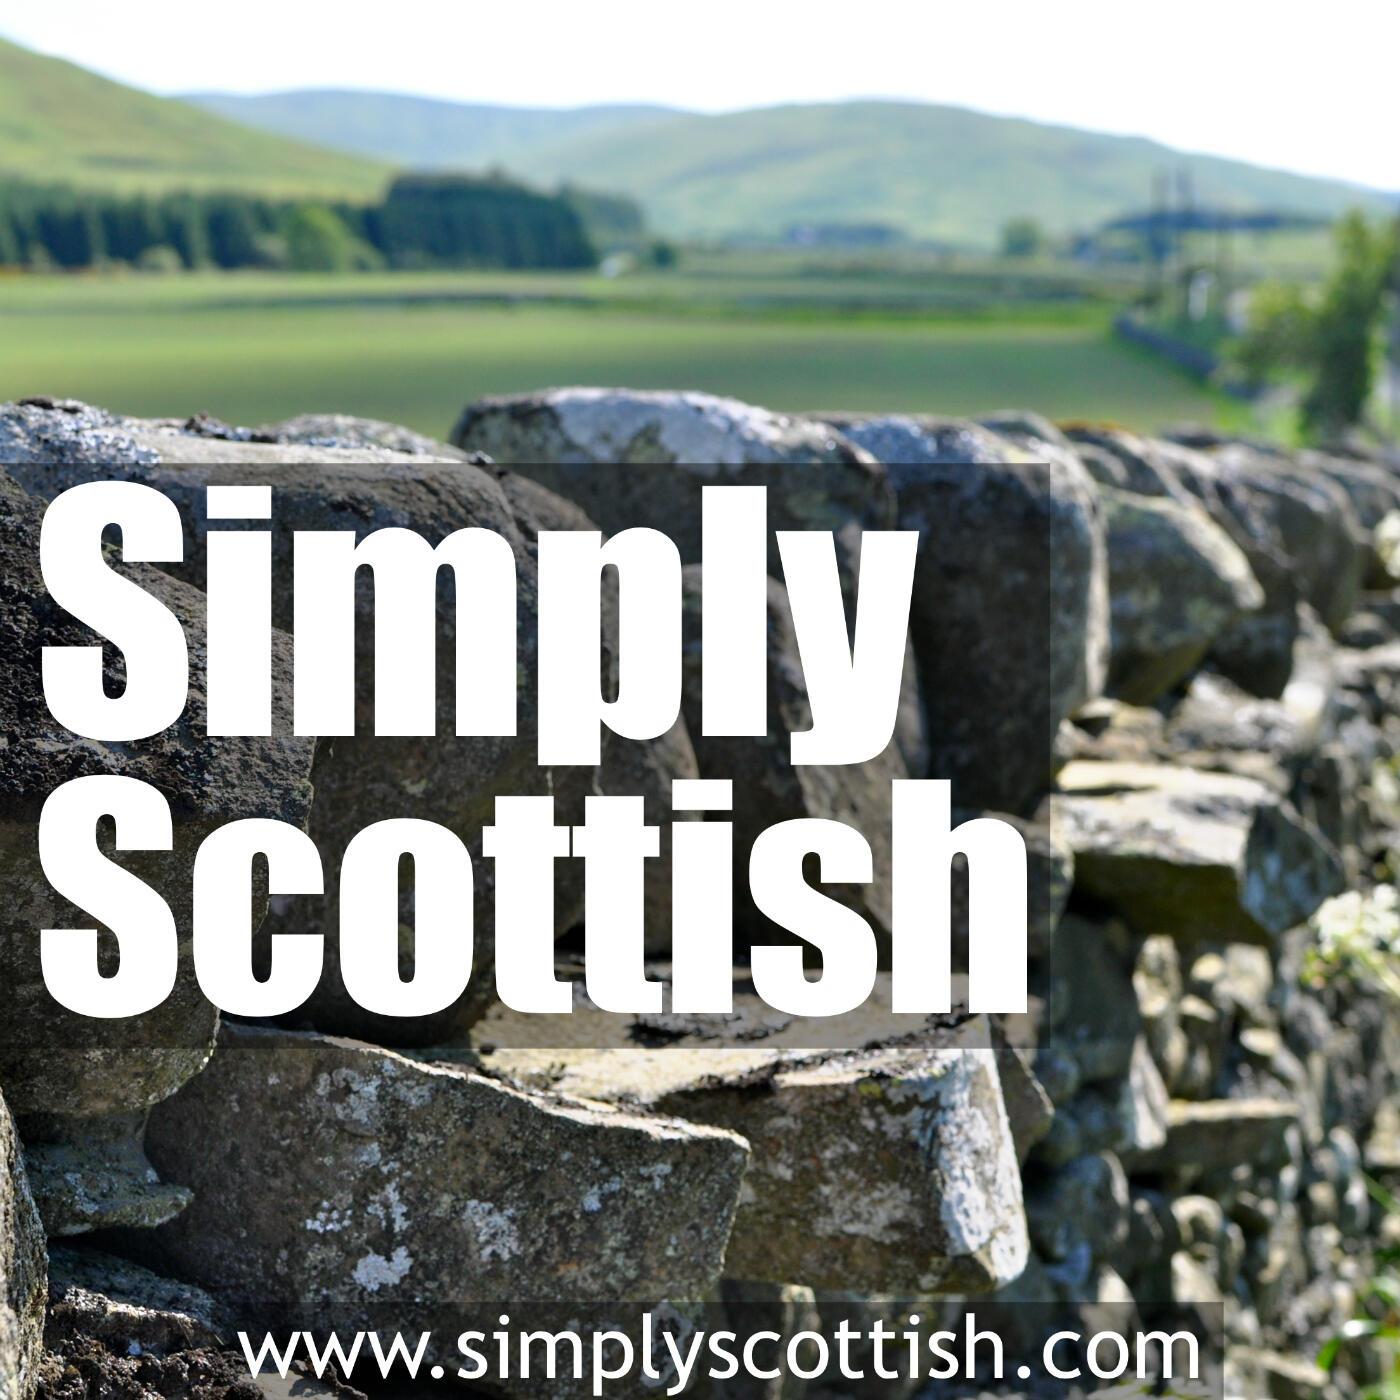 Simply Scottish